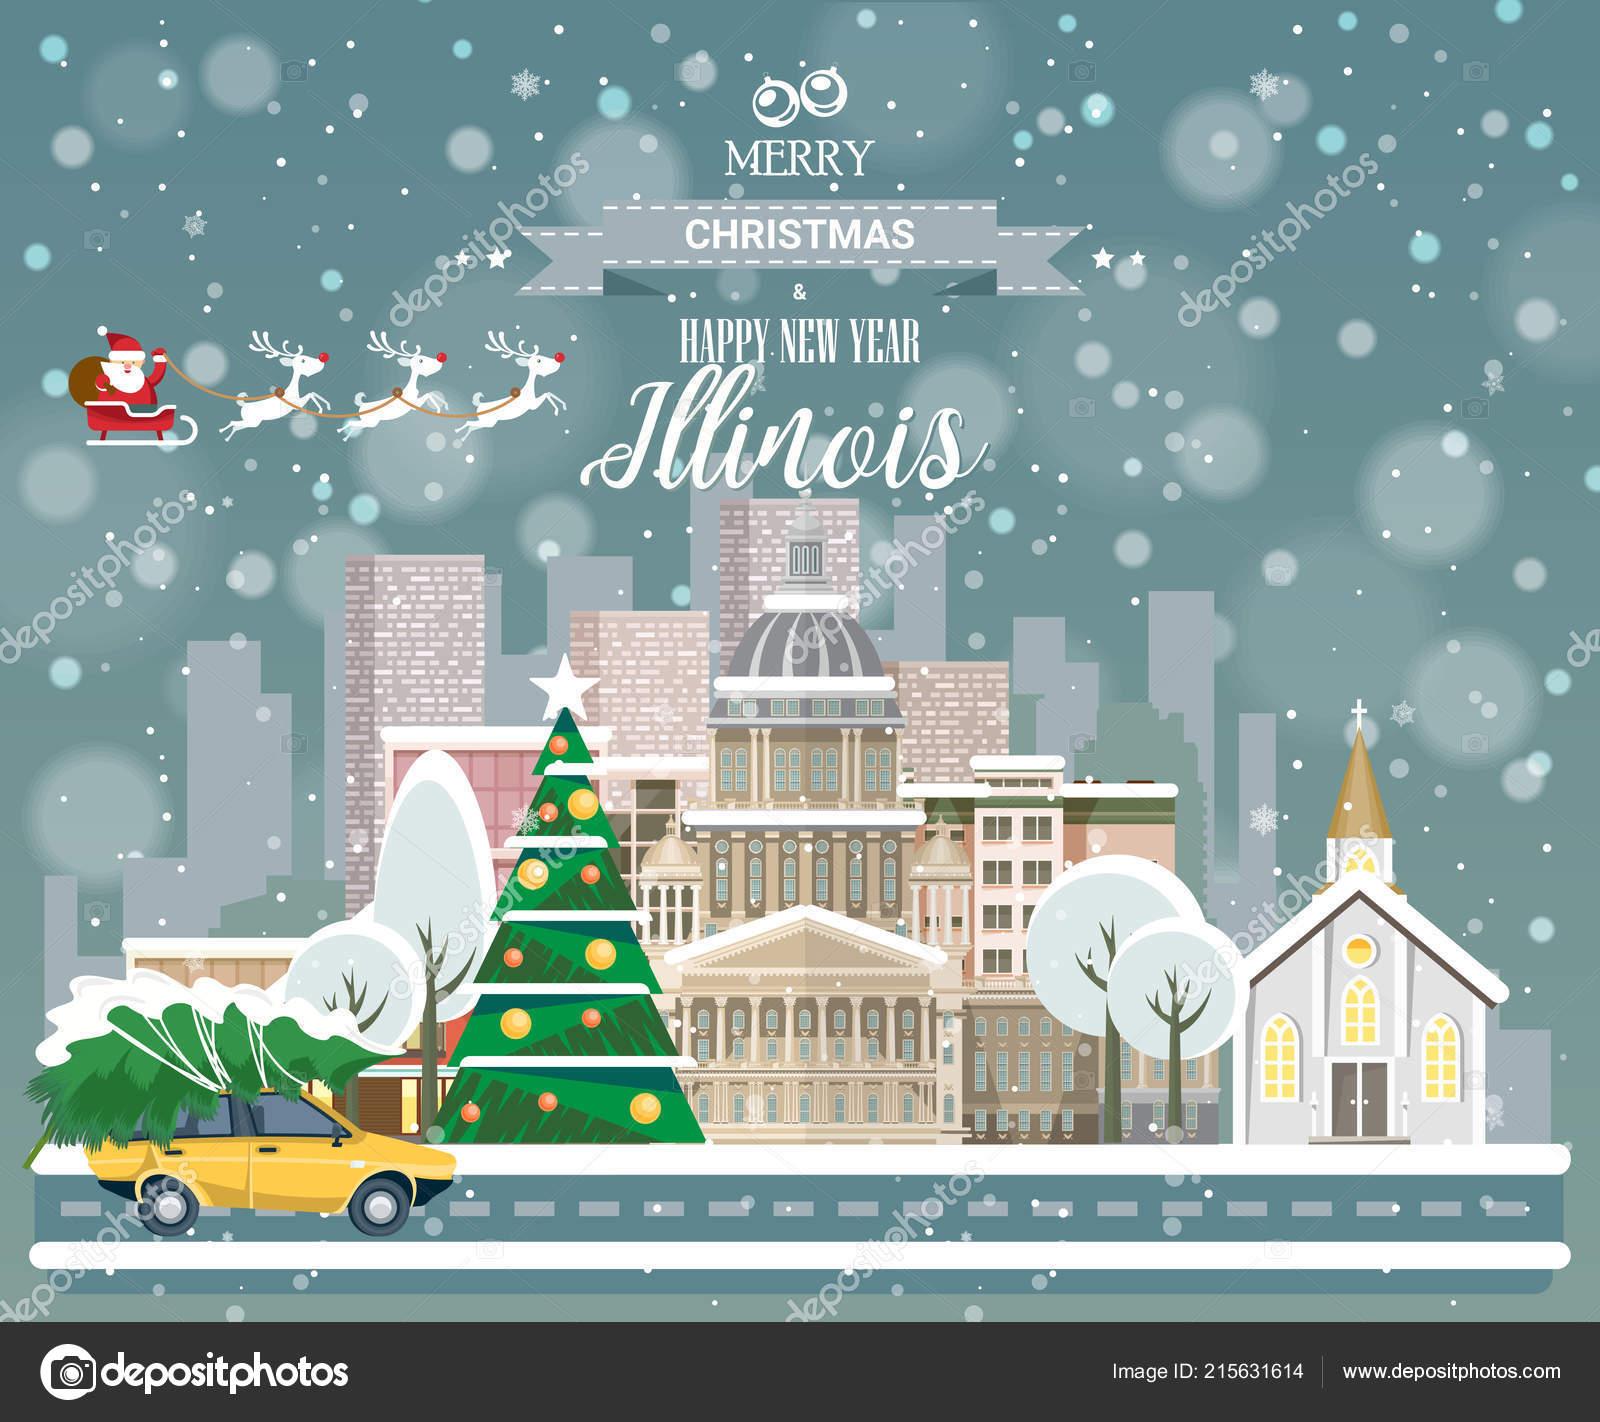 merry christmas happy new year illinois greeting festive card usa stock vector